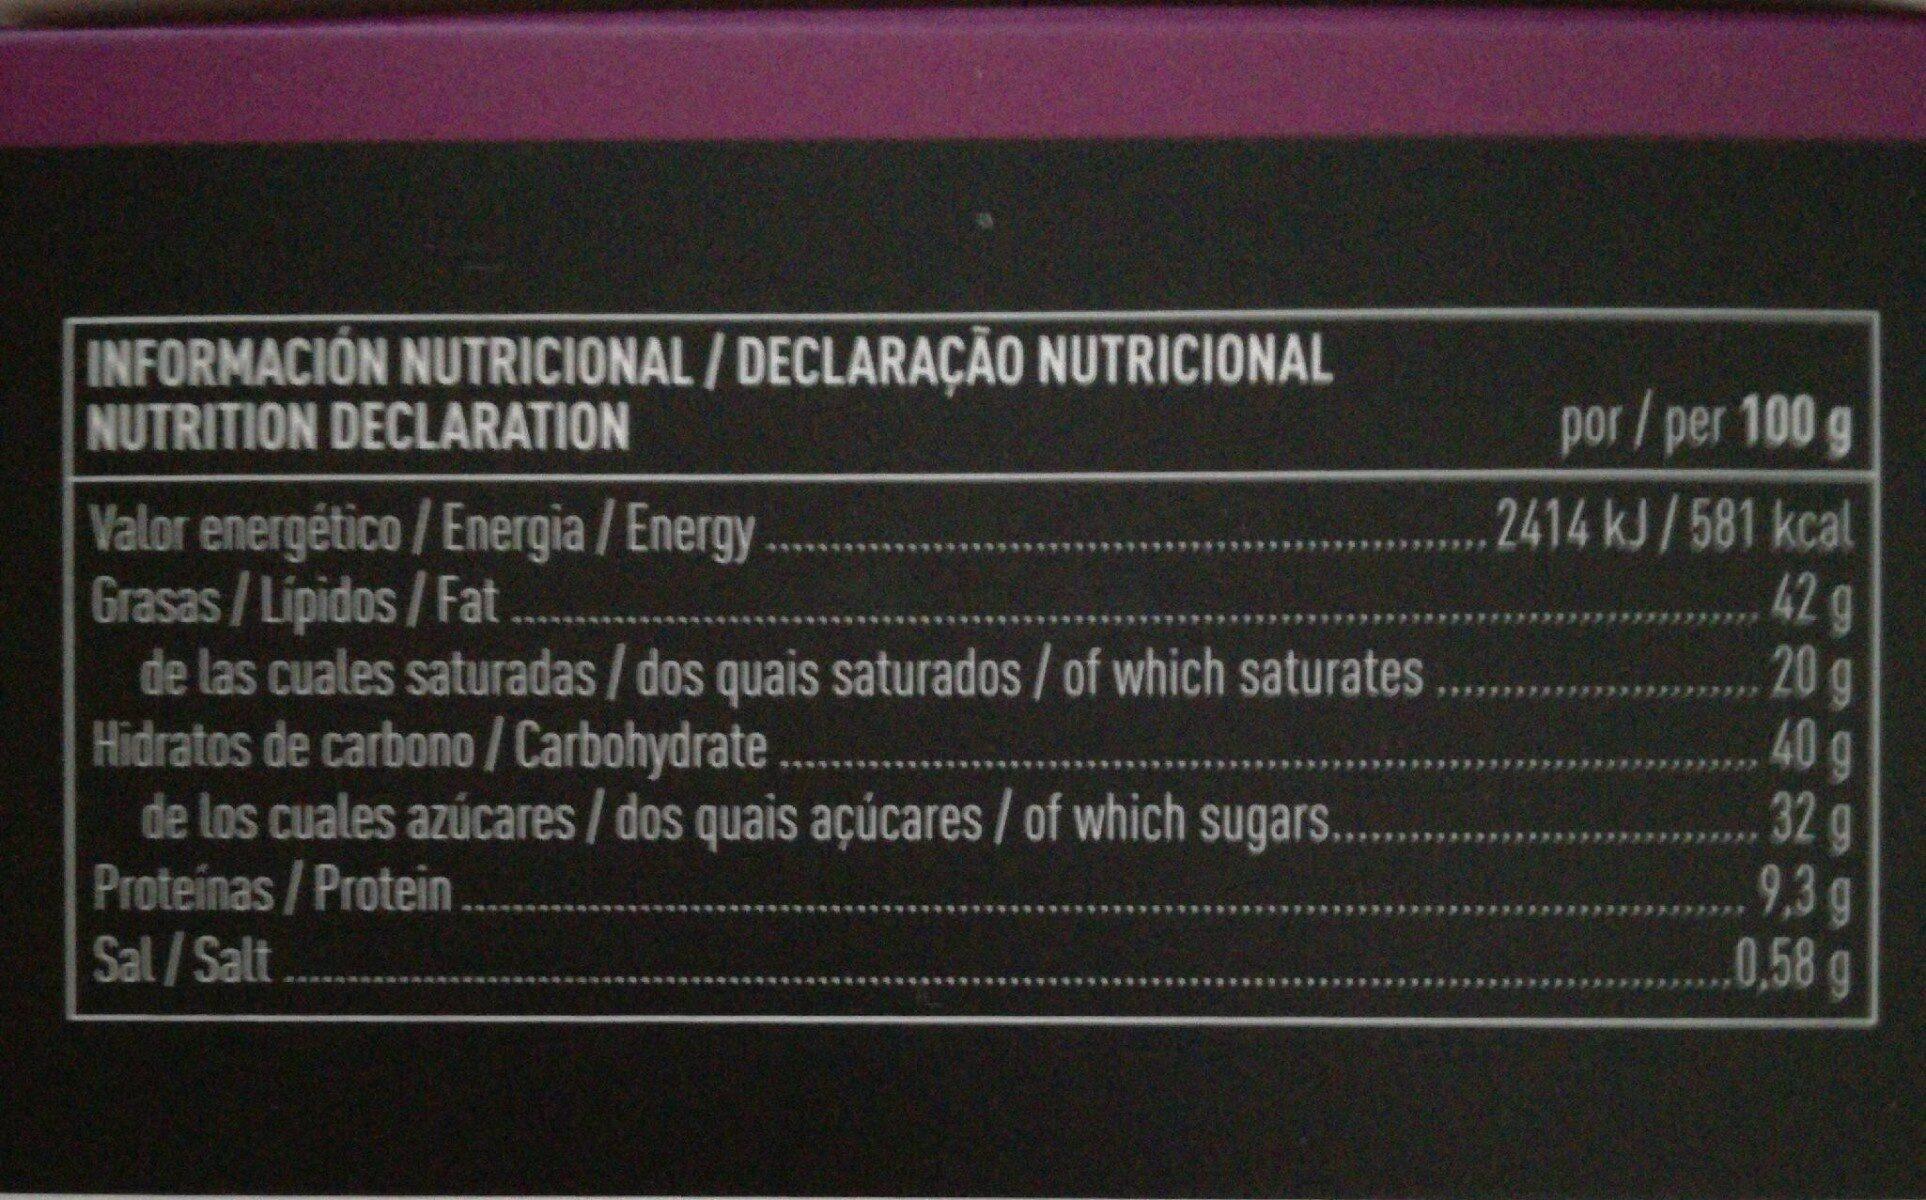 Bombón de avellana y praliné - Nutrition facts